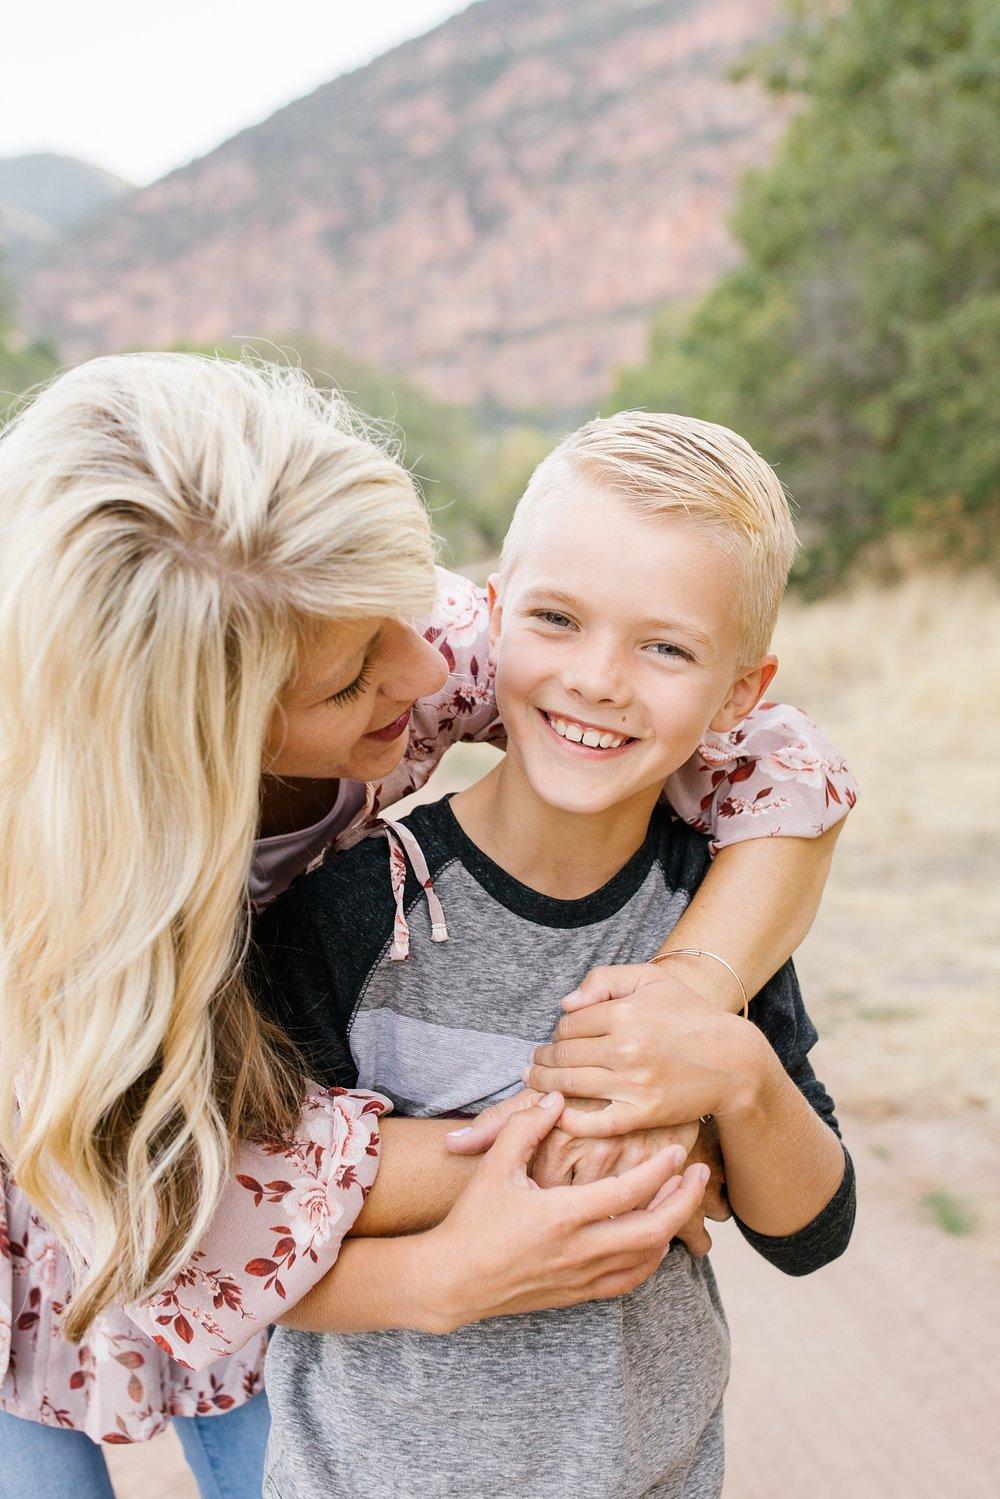 Foote-90_Lizzie-B-Imagery-Utah-Family-Photographer-Lifestyle-Photography-Salt-Lake-City-Park-City-Utah-County.jpg